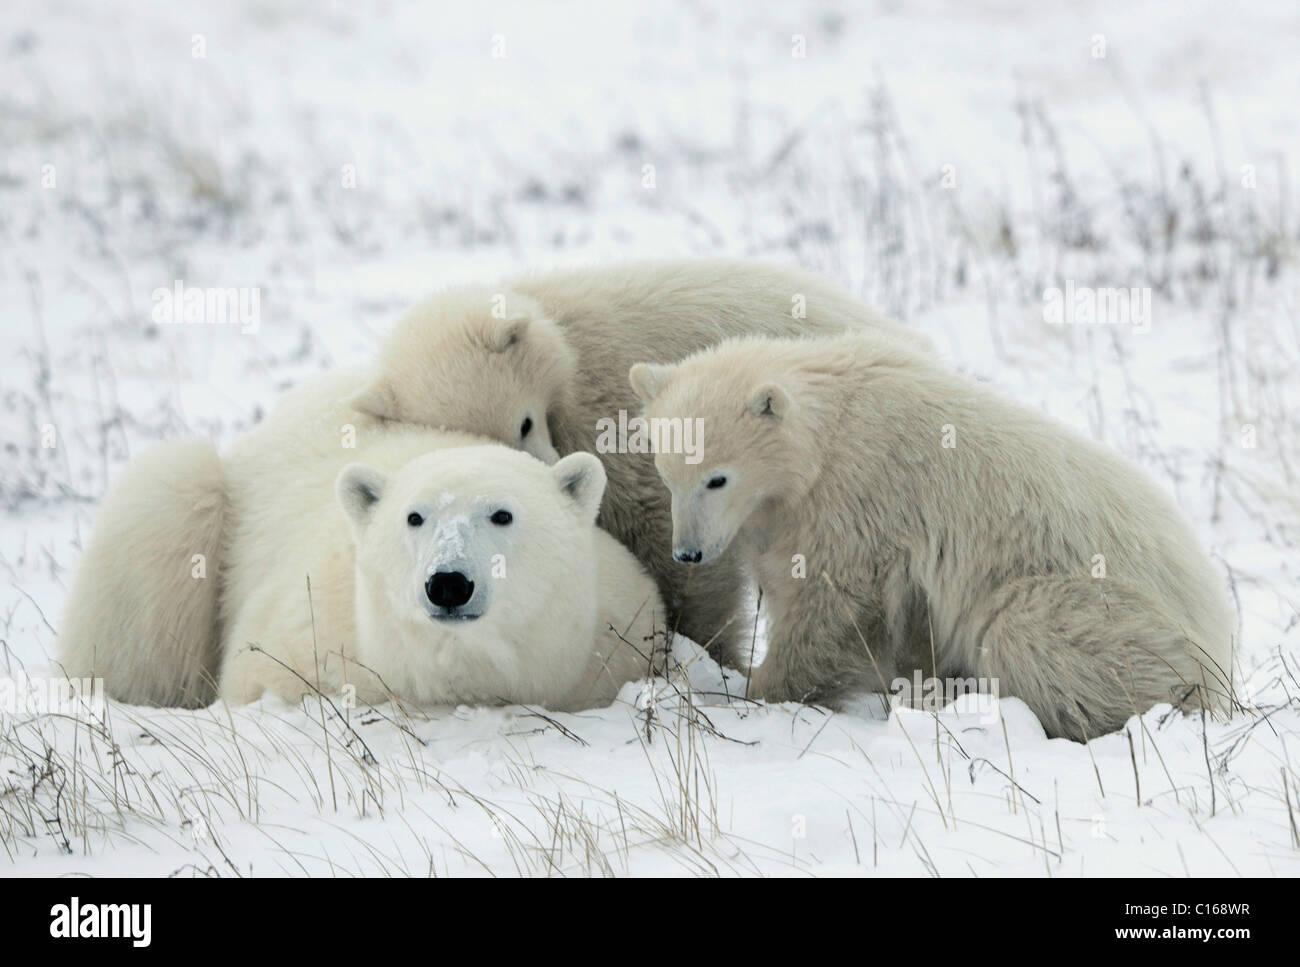 Polar she-bear with cubs. - Stock Image